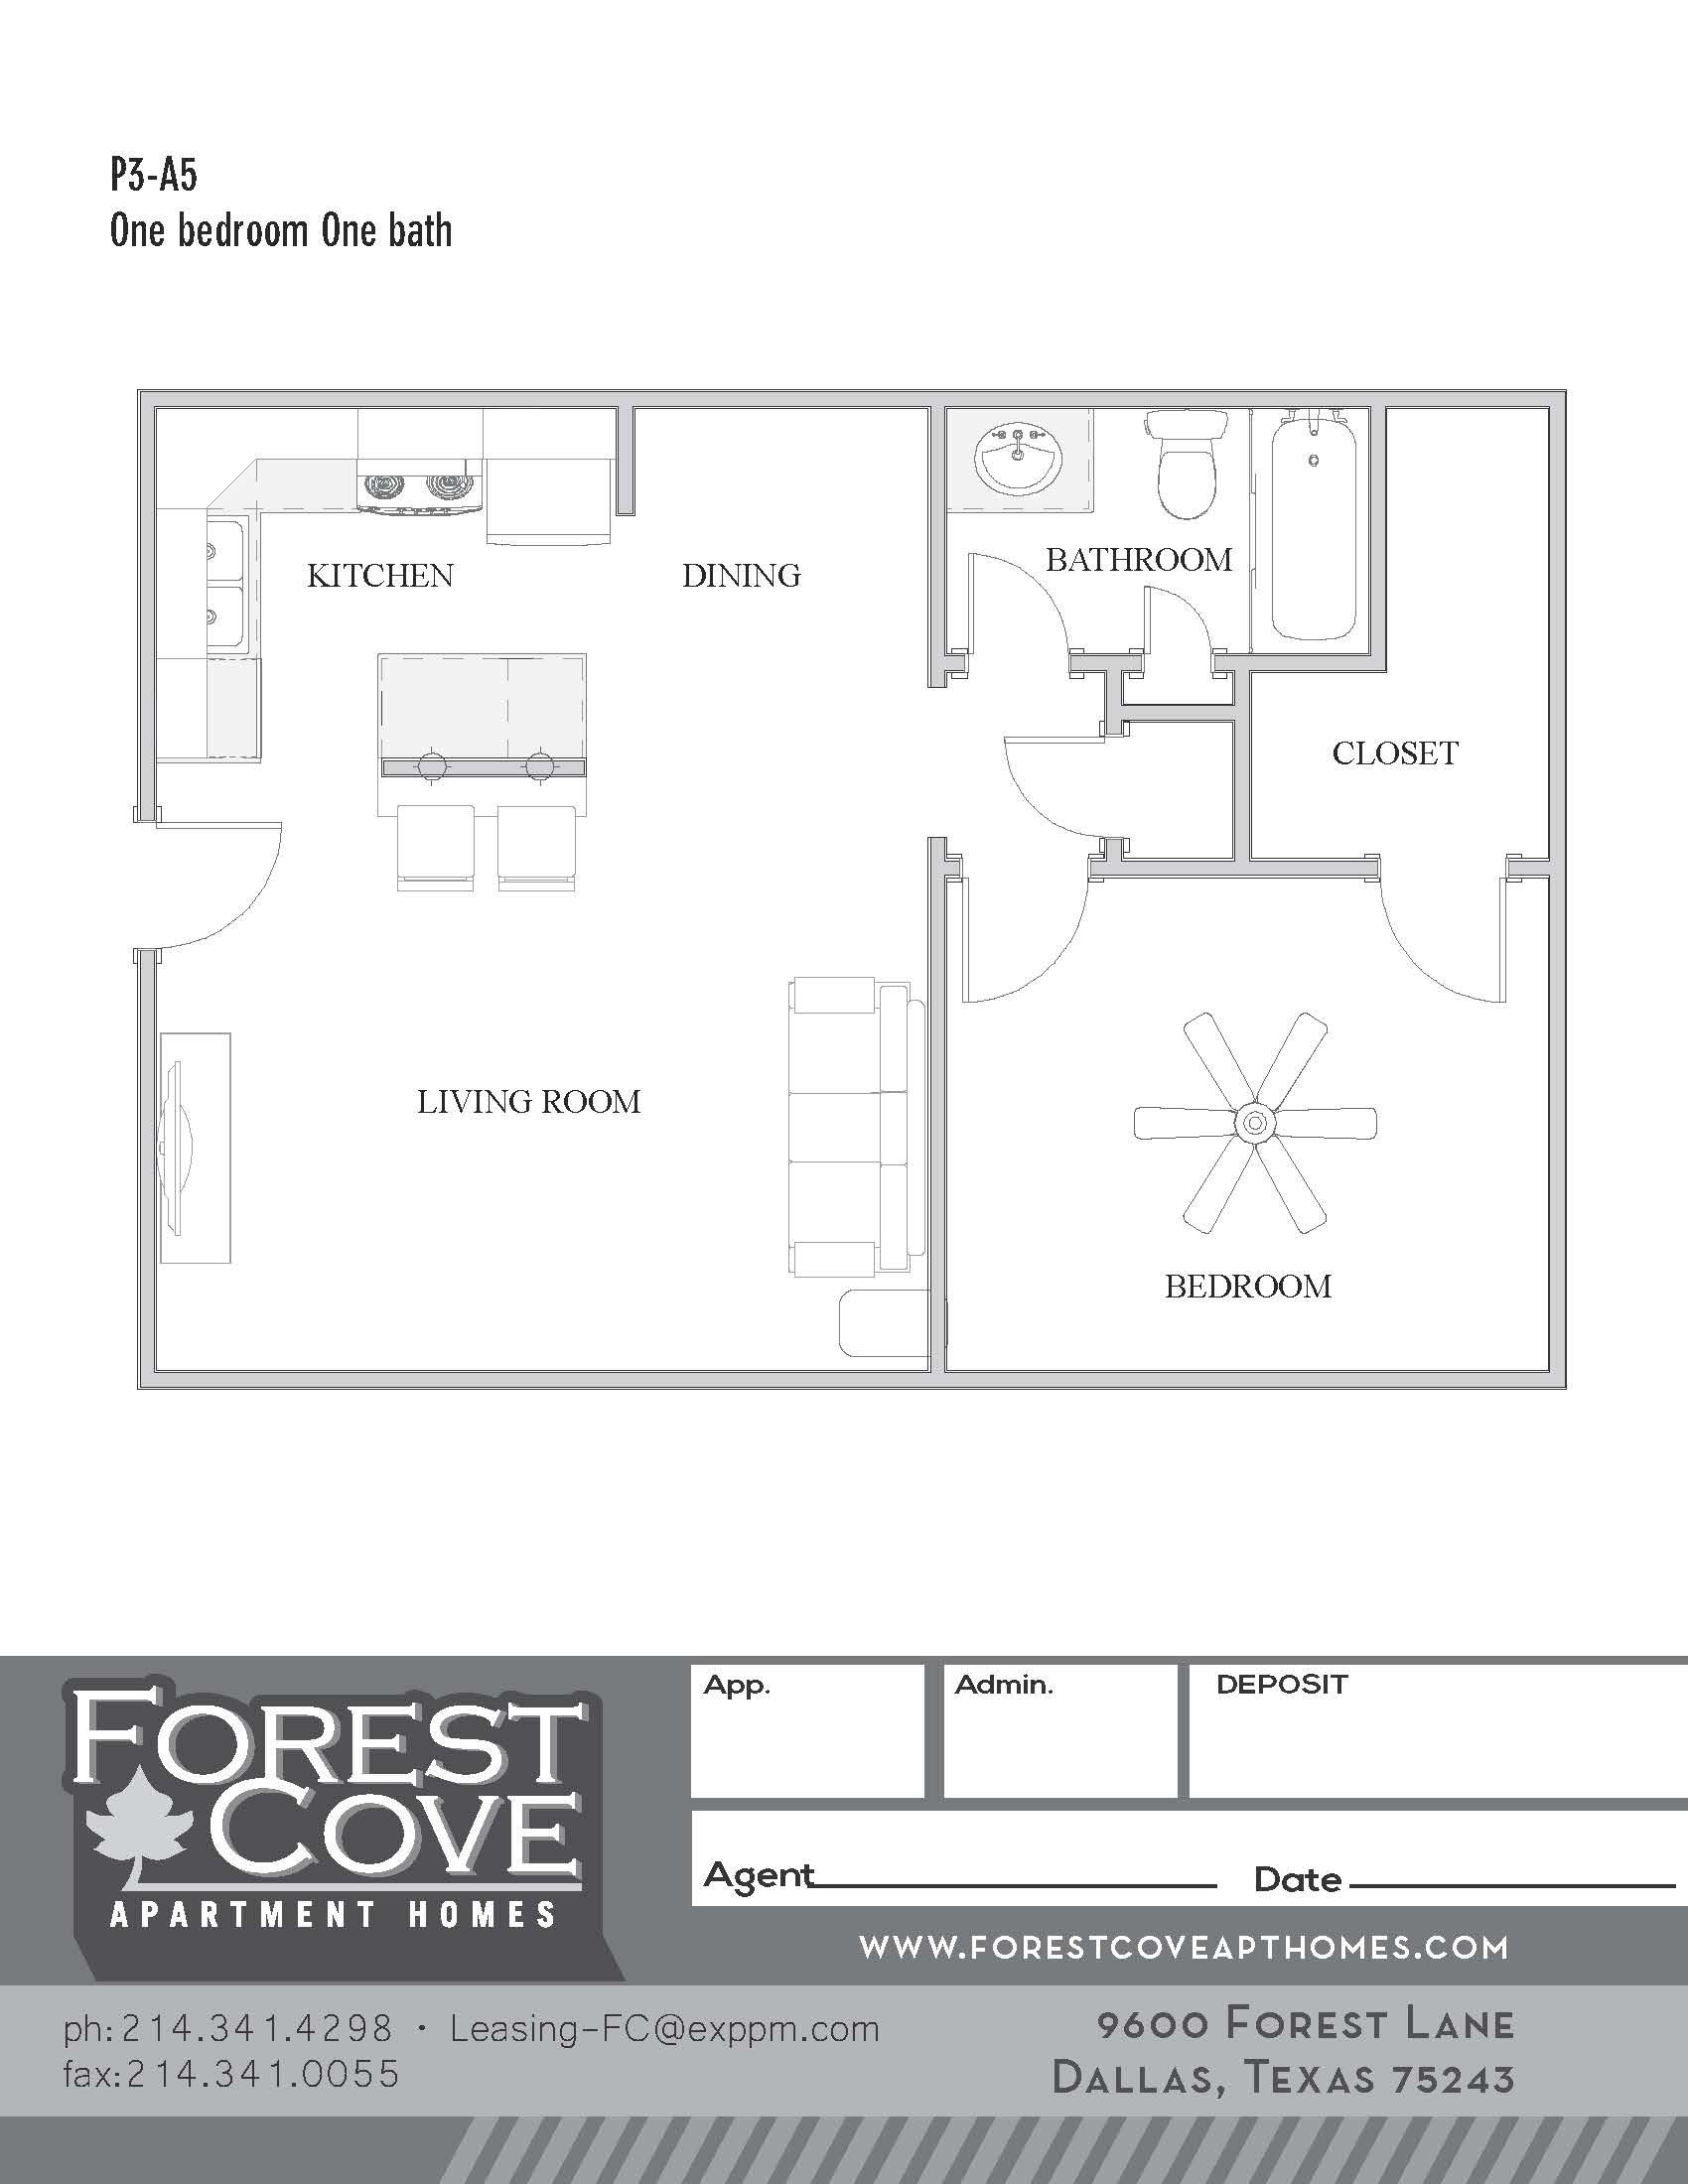 Floorplan - 3-A5 image